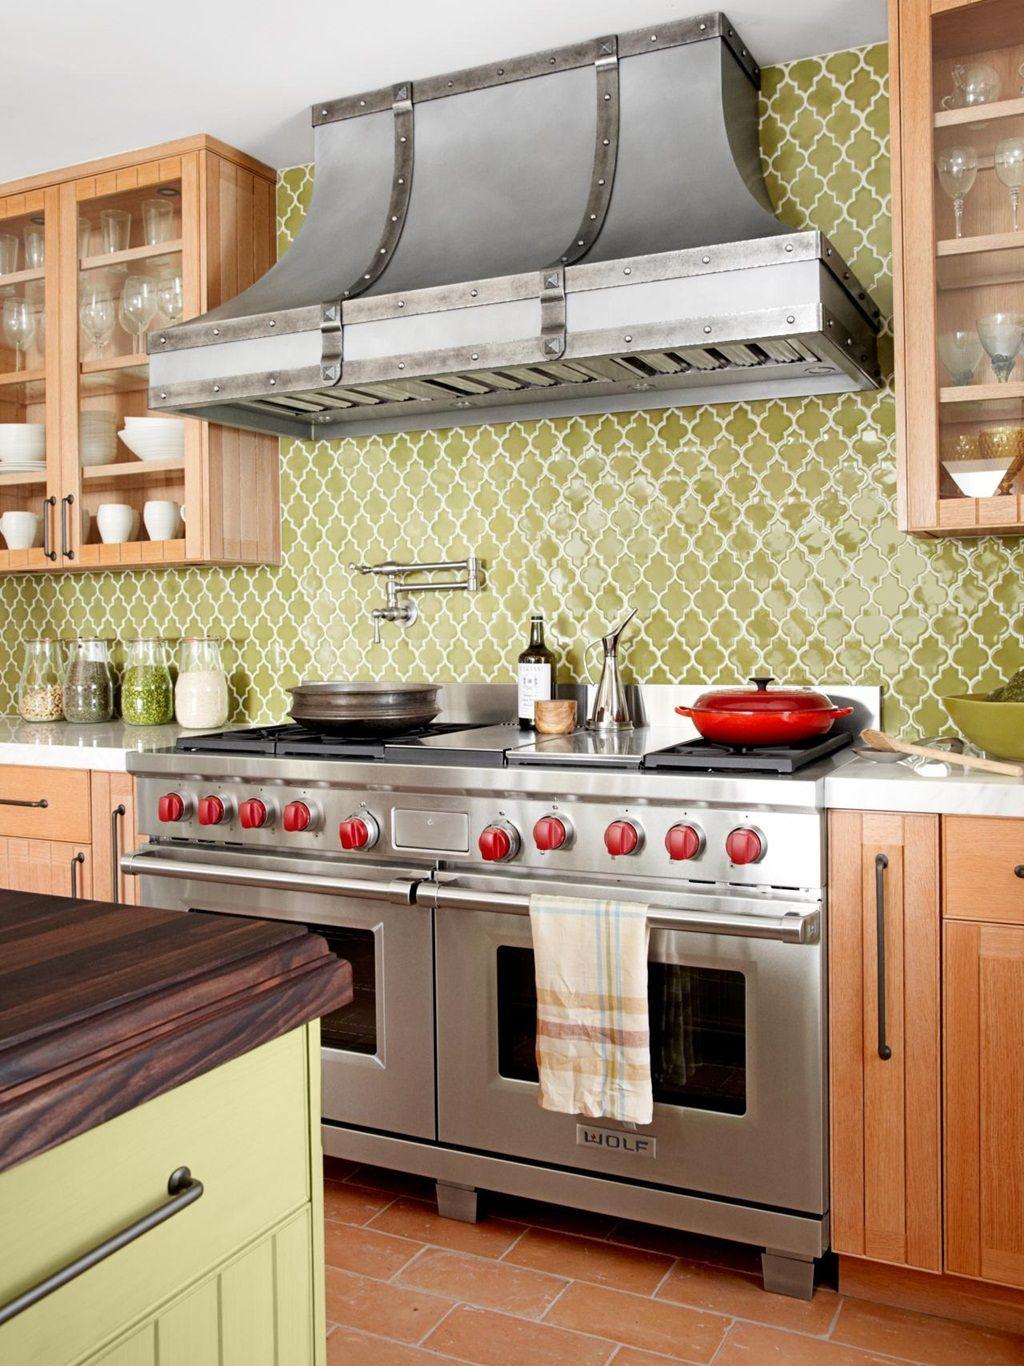 2019 kitchen backsplash  a beautiful aesthetic decorative